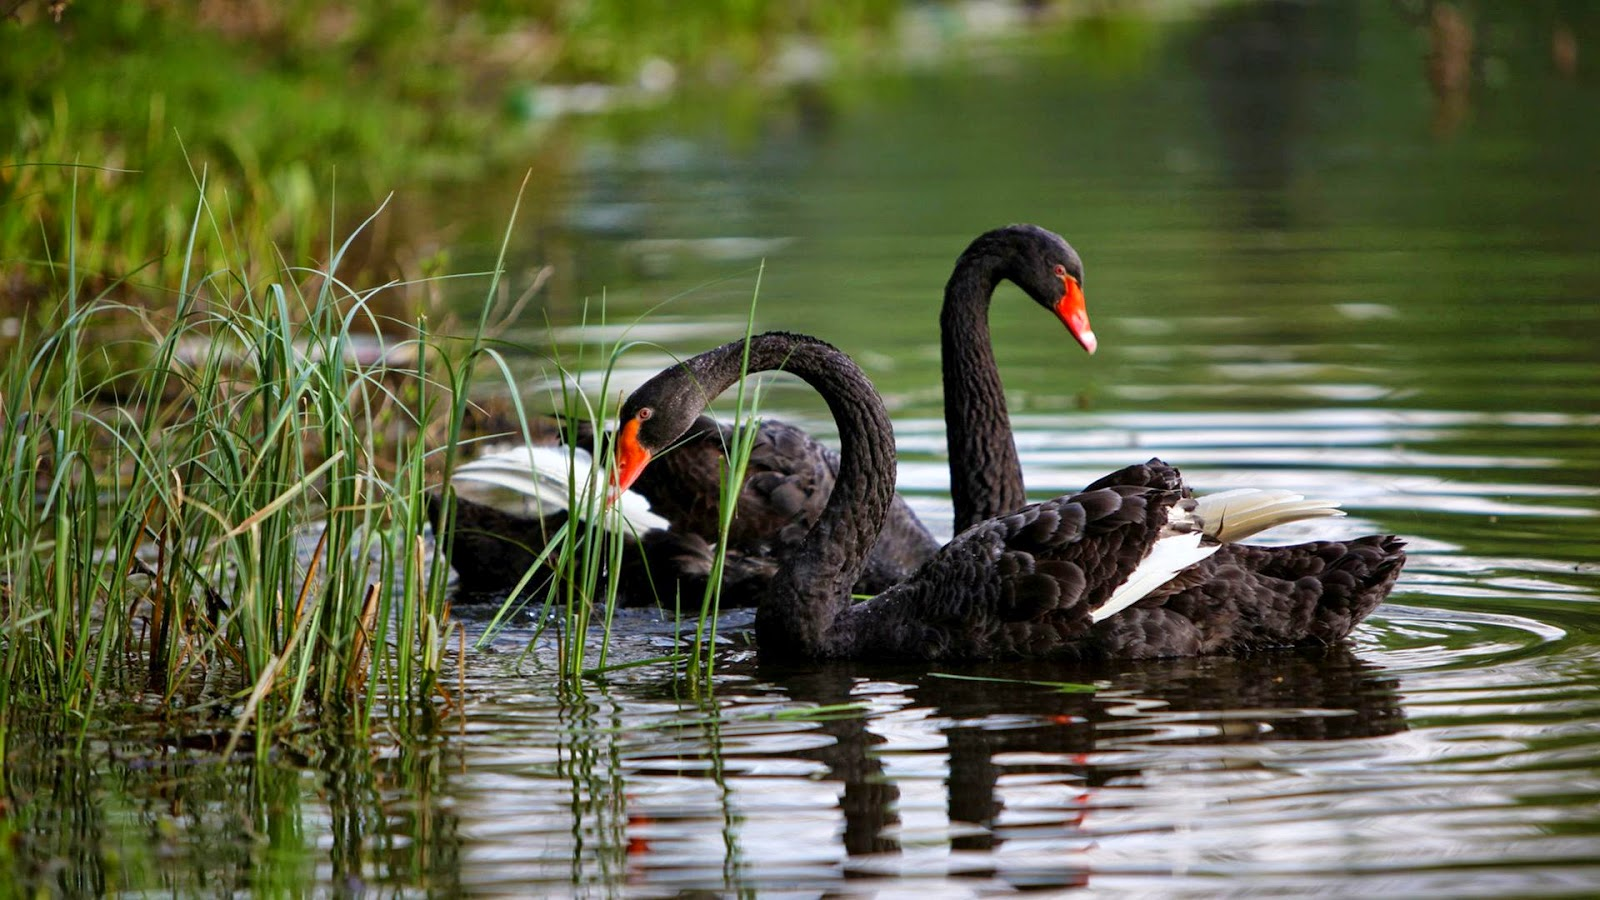 Black swans hd wallpaper hd wallpapers high quality - Animal and bird hd wallpaper ...